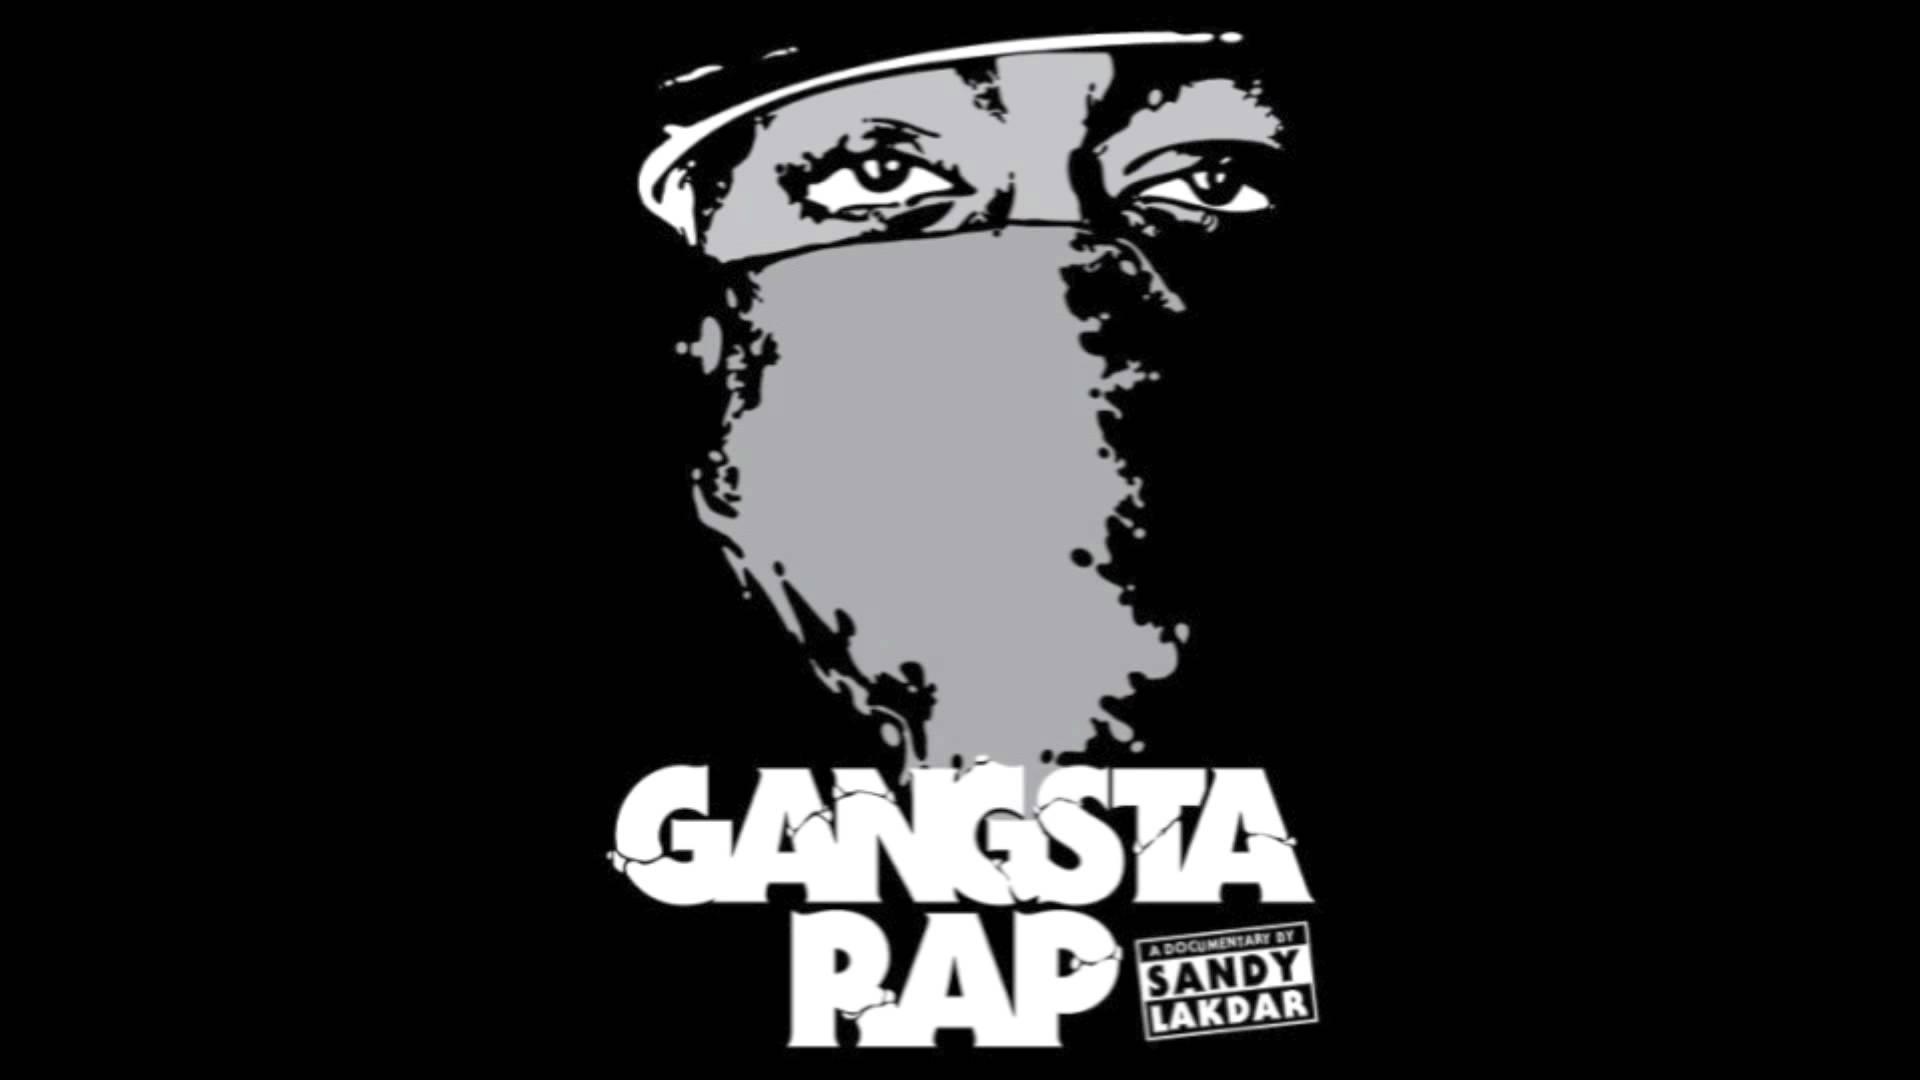 Most Inspiring Wallpaper Logo Gangster - wp2564483  Best Photo Reference_158275.jpg